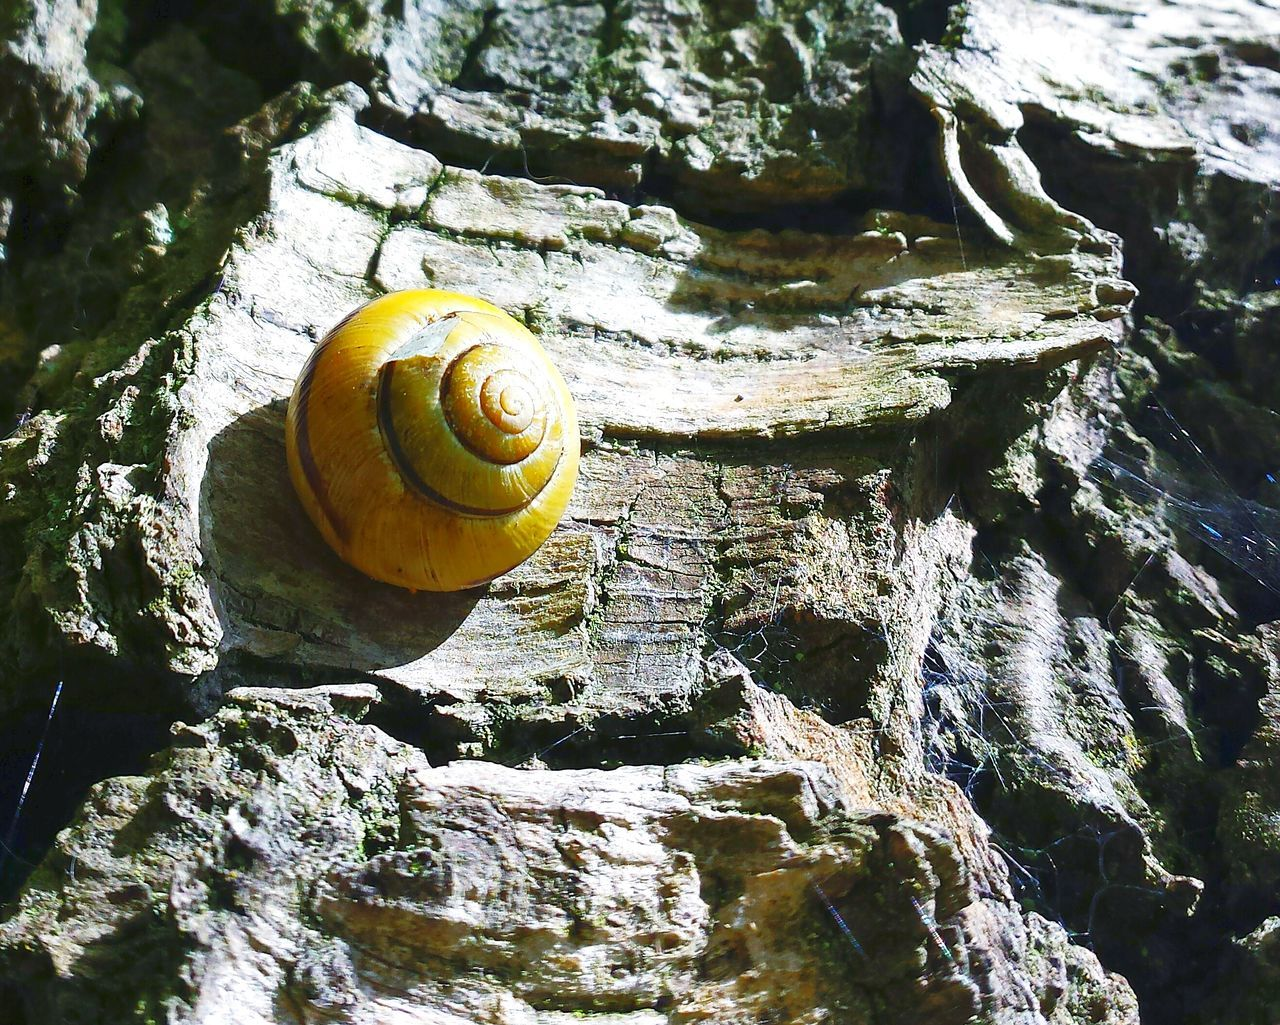 Snail On Tree Trunk